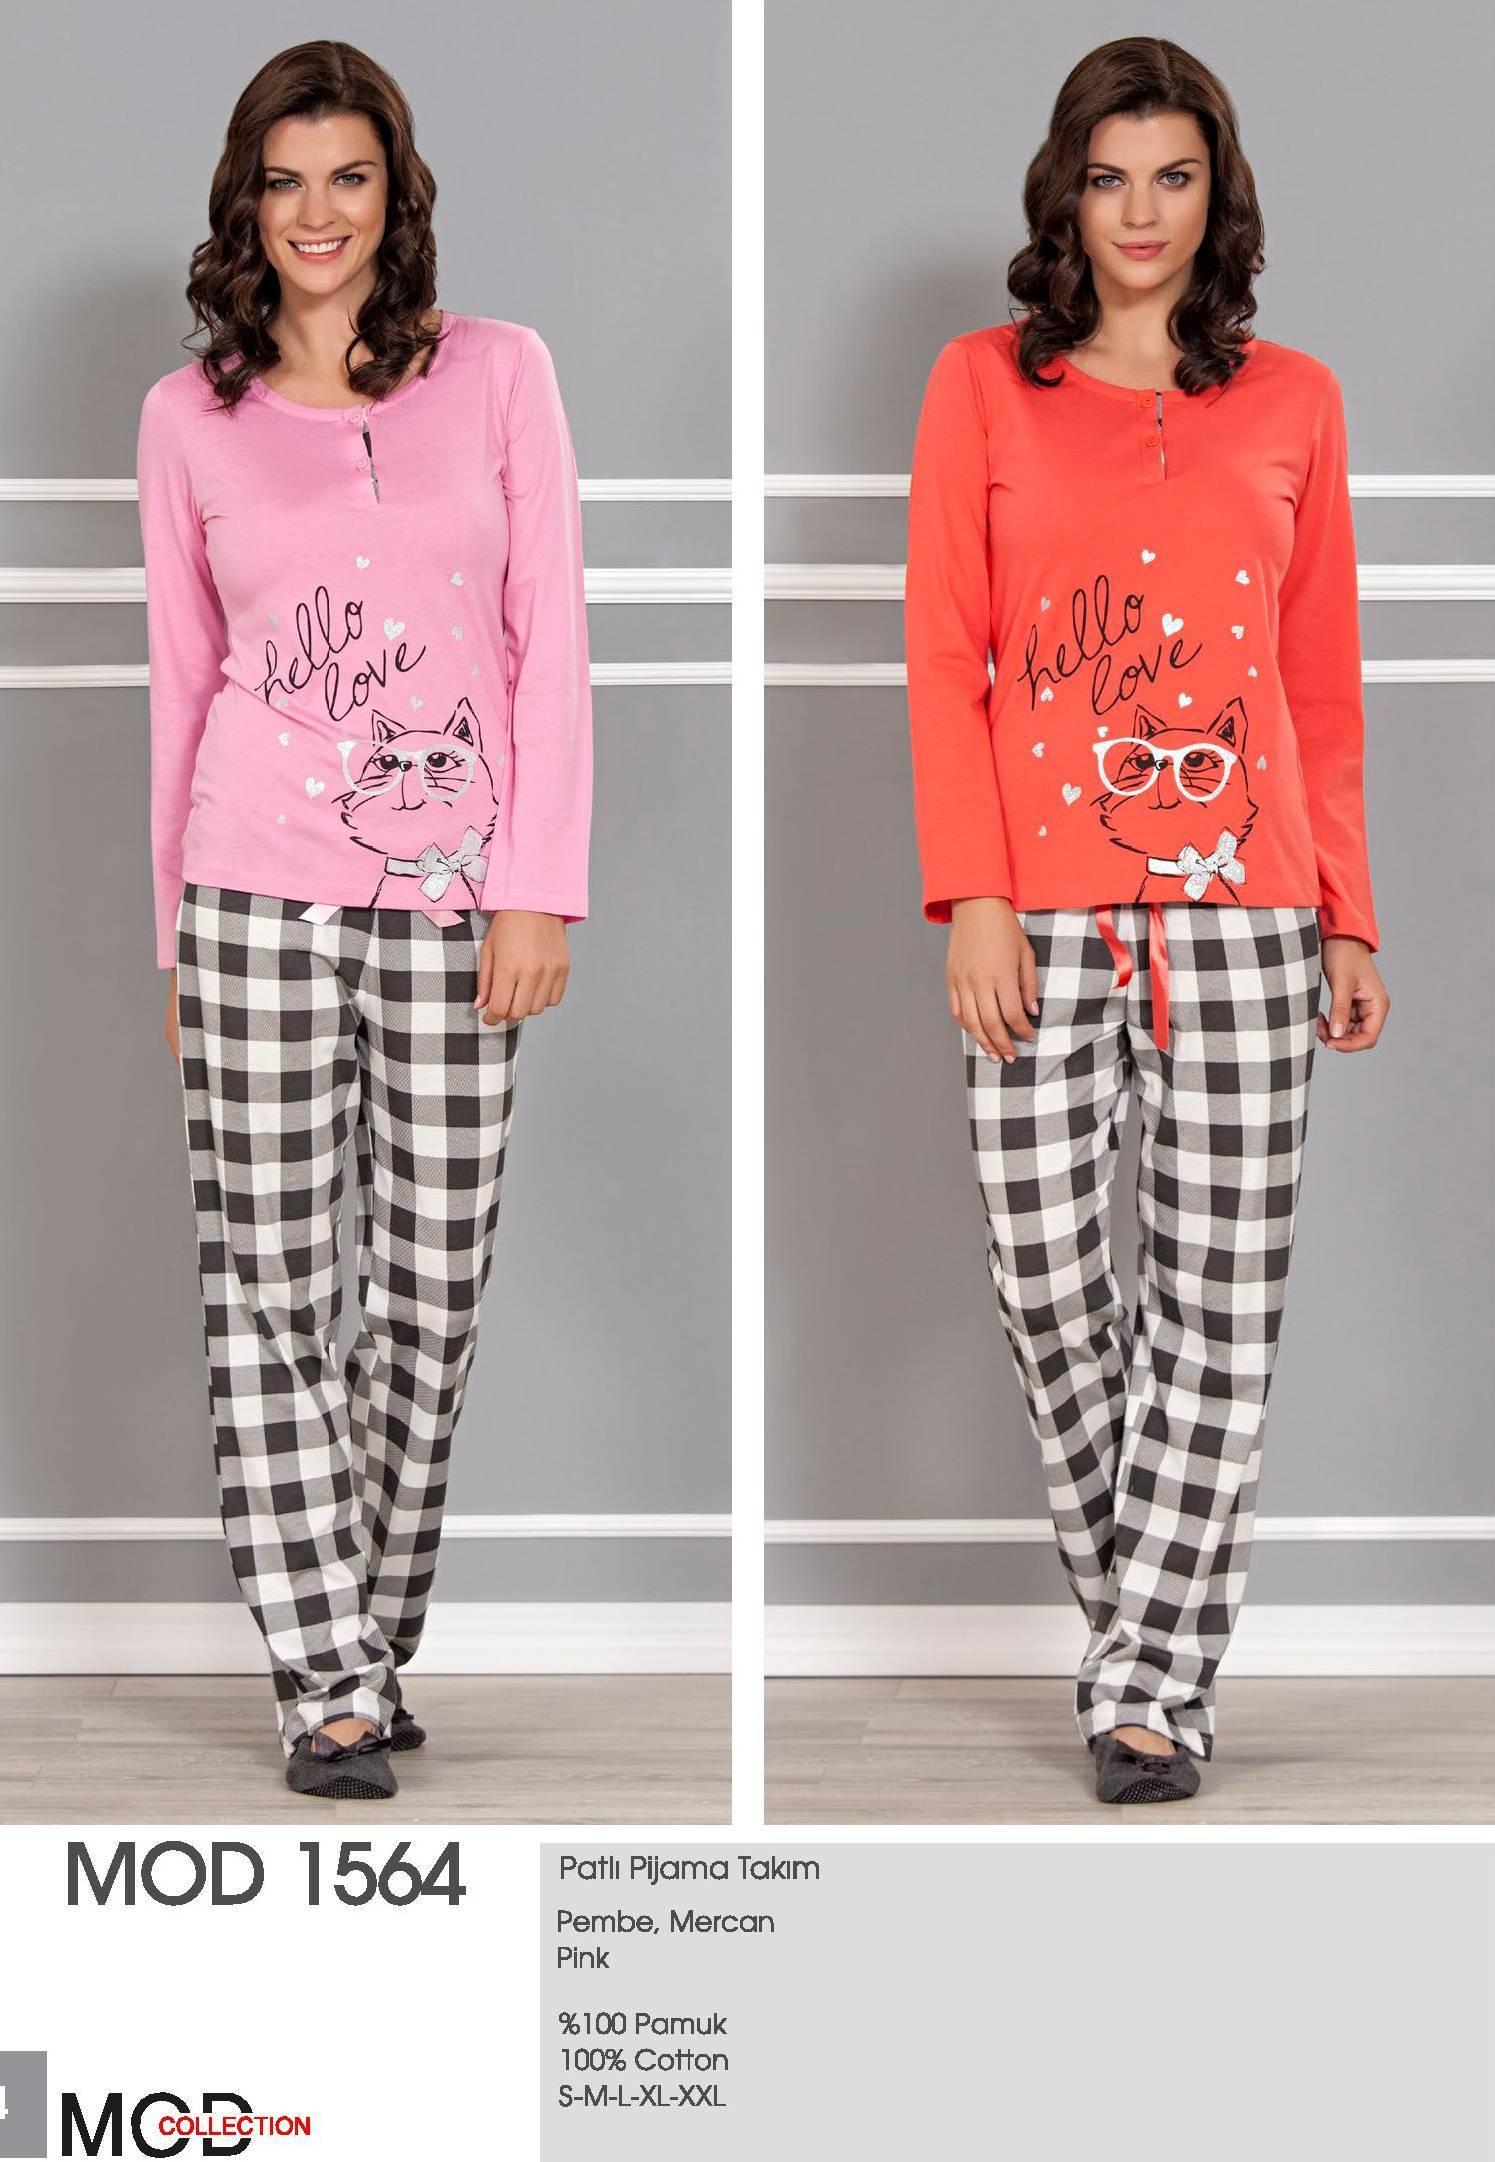 Mod Collection Bayan Patlı Pijama Takım 1564